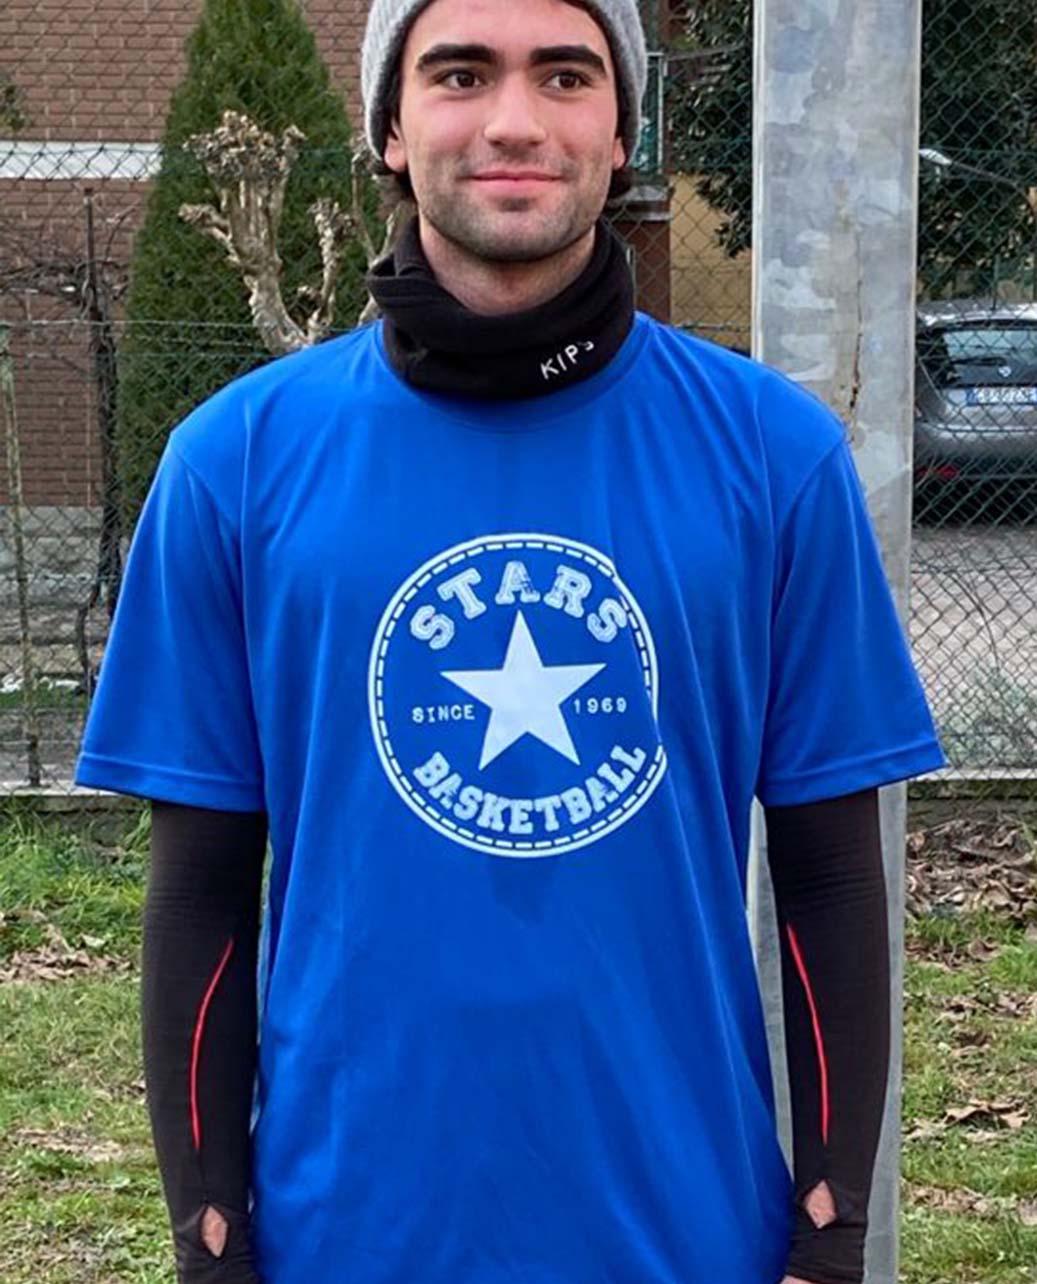 Alessandro Bortolotti - Under 18